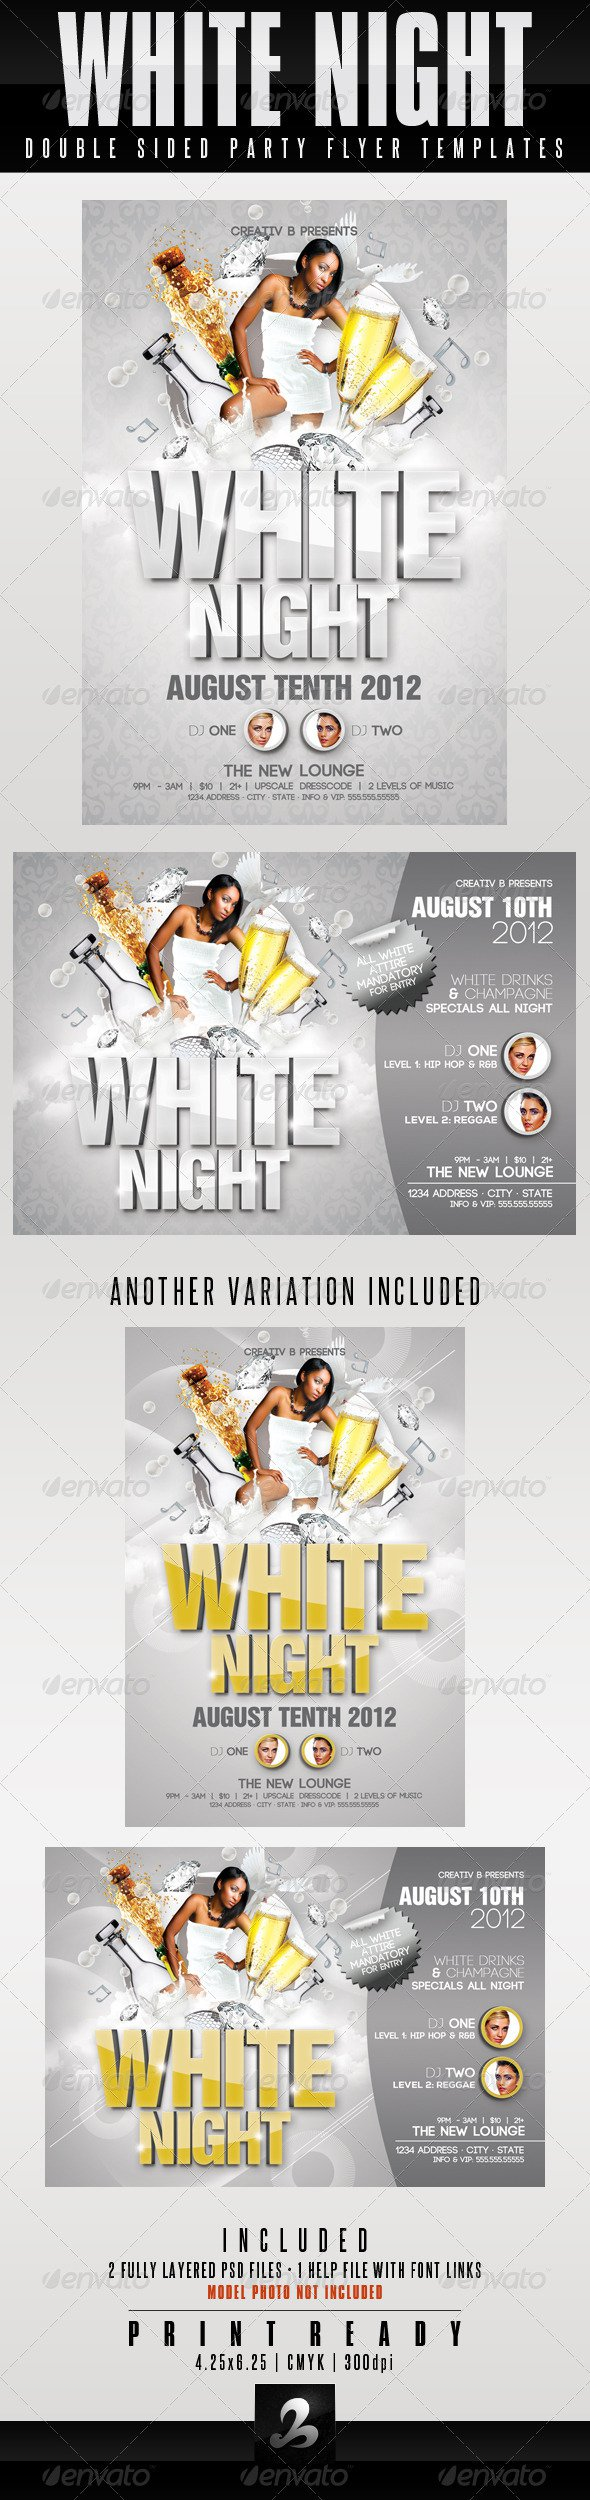 White Party Invitations Templates